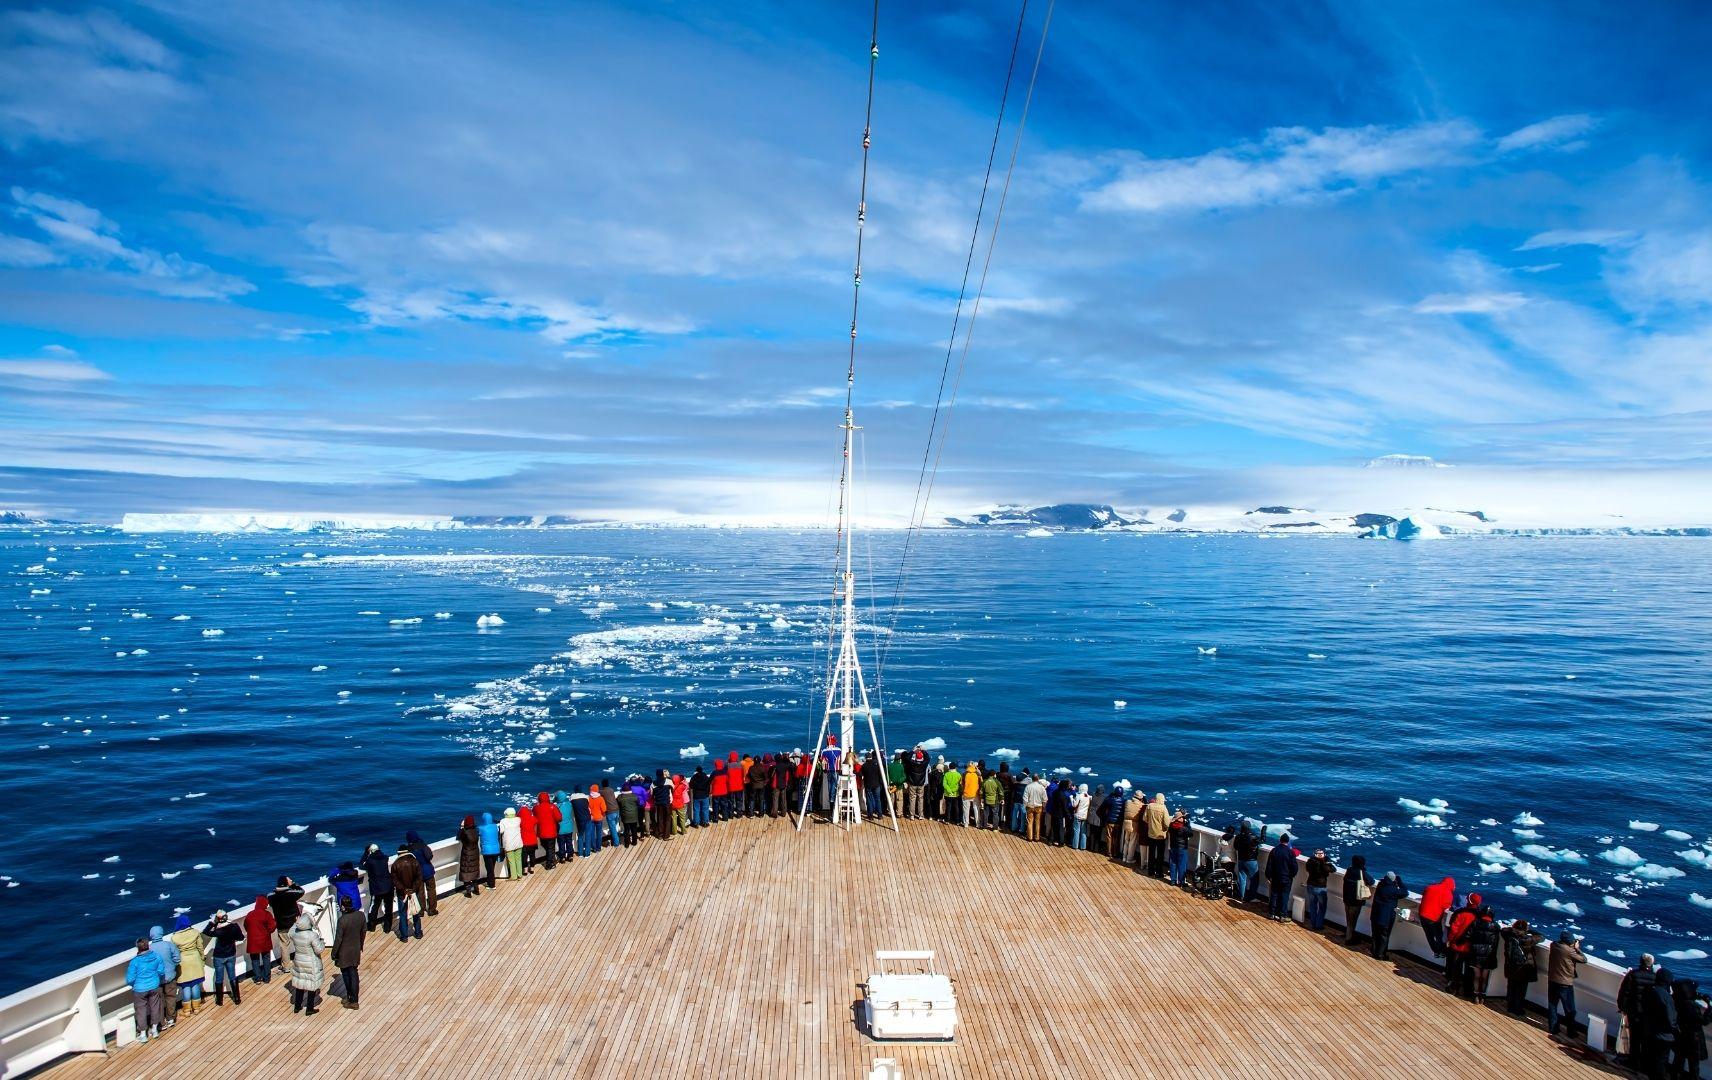 Kreuzfahrt top ten - Antarktis